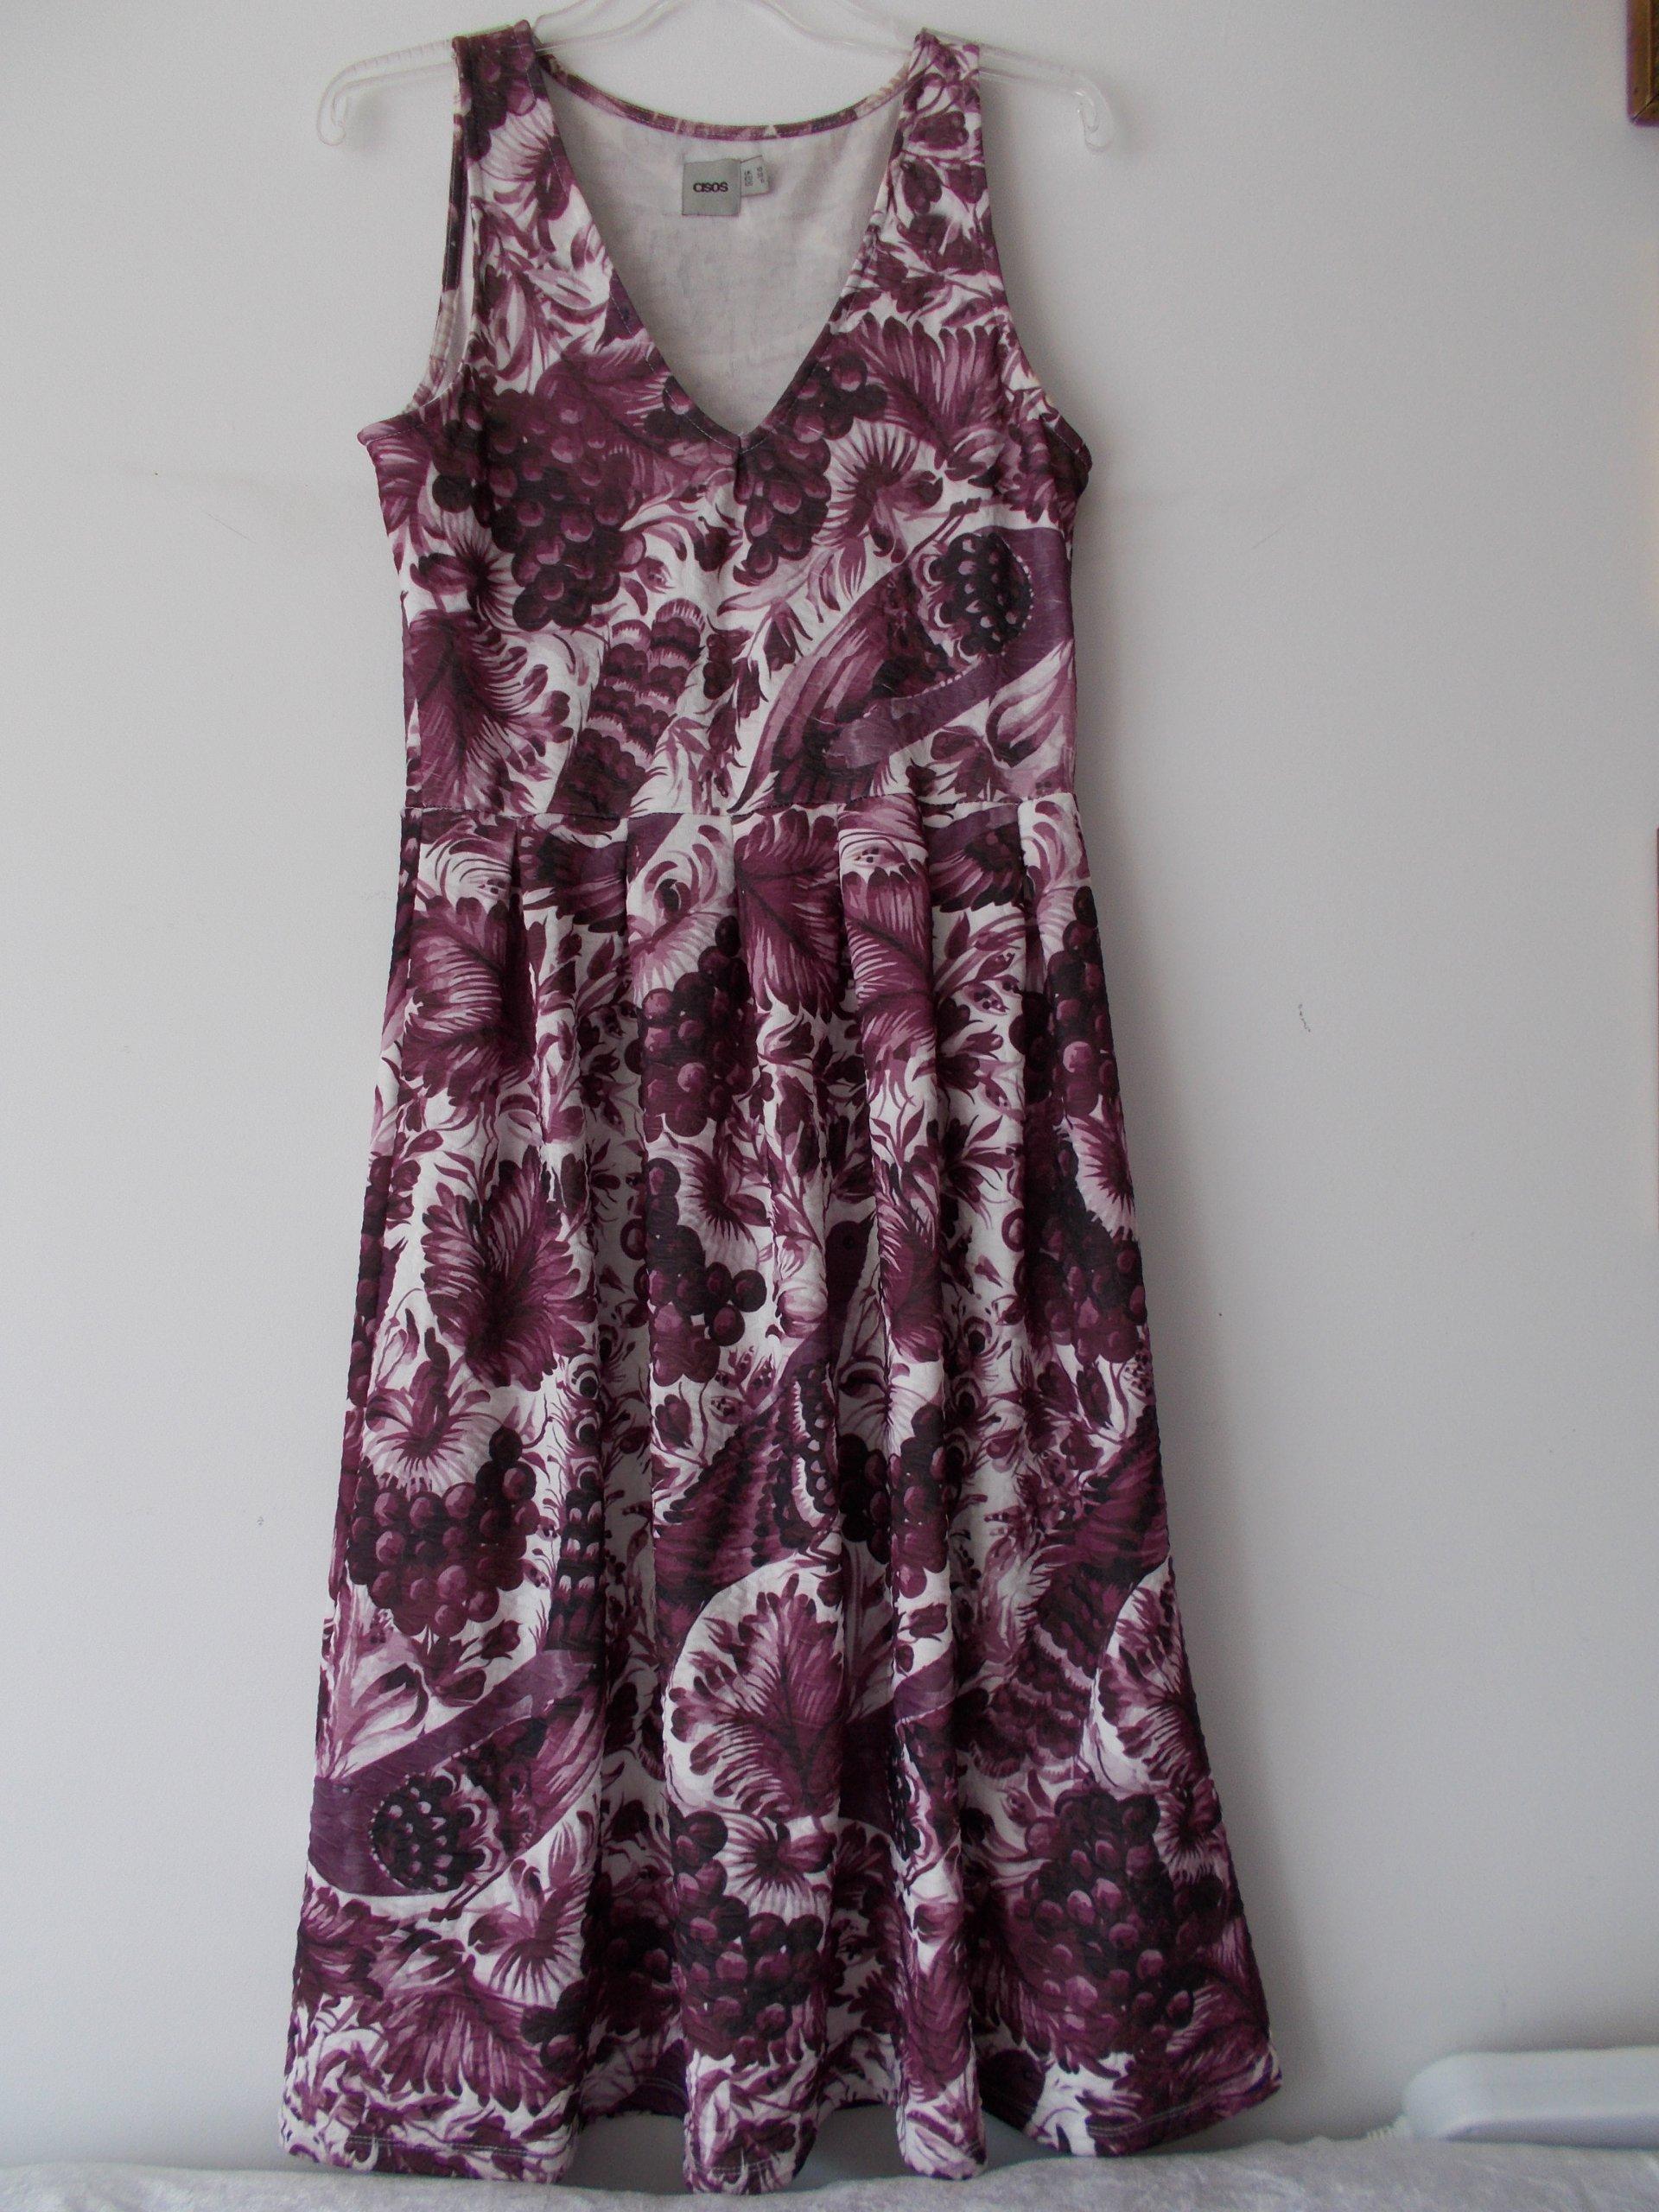 504807279a2ba sukienka ASOS rozmiar 38 - - 7653496803 - oficjalne archiwum allegro